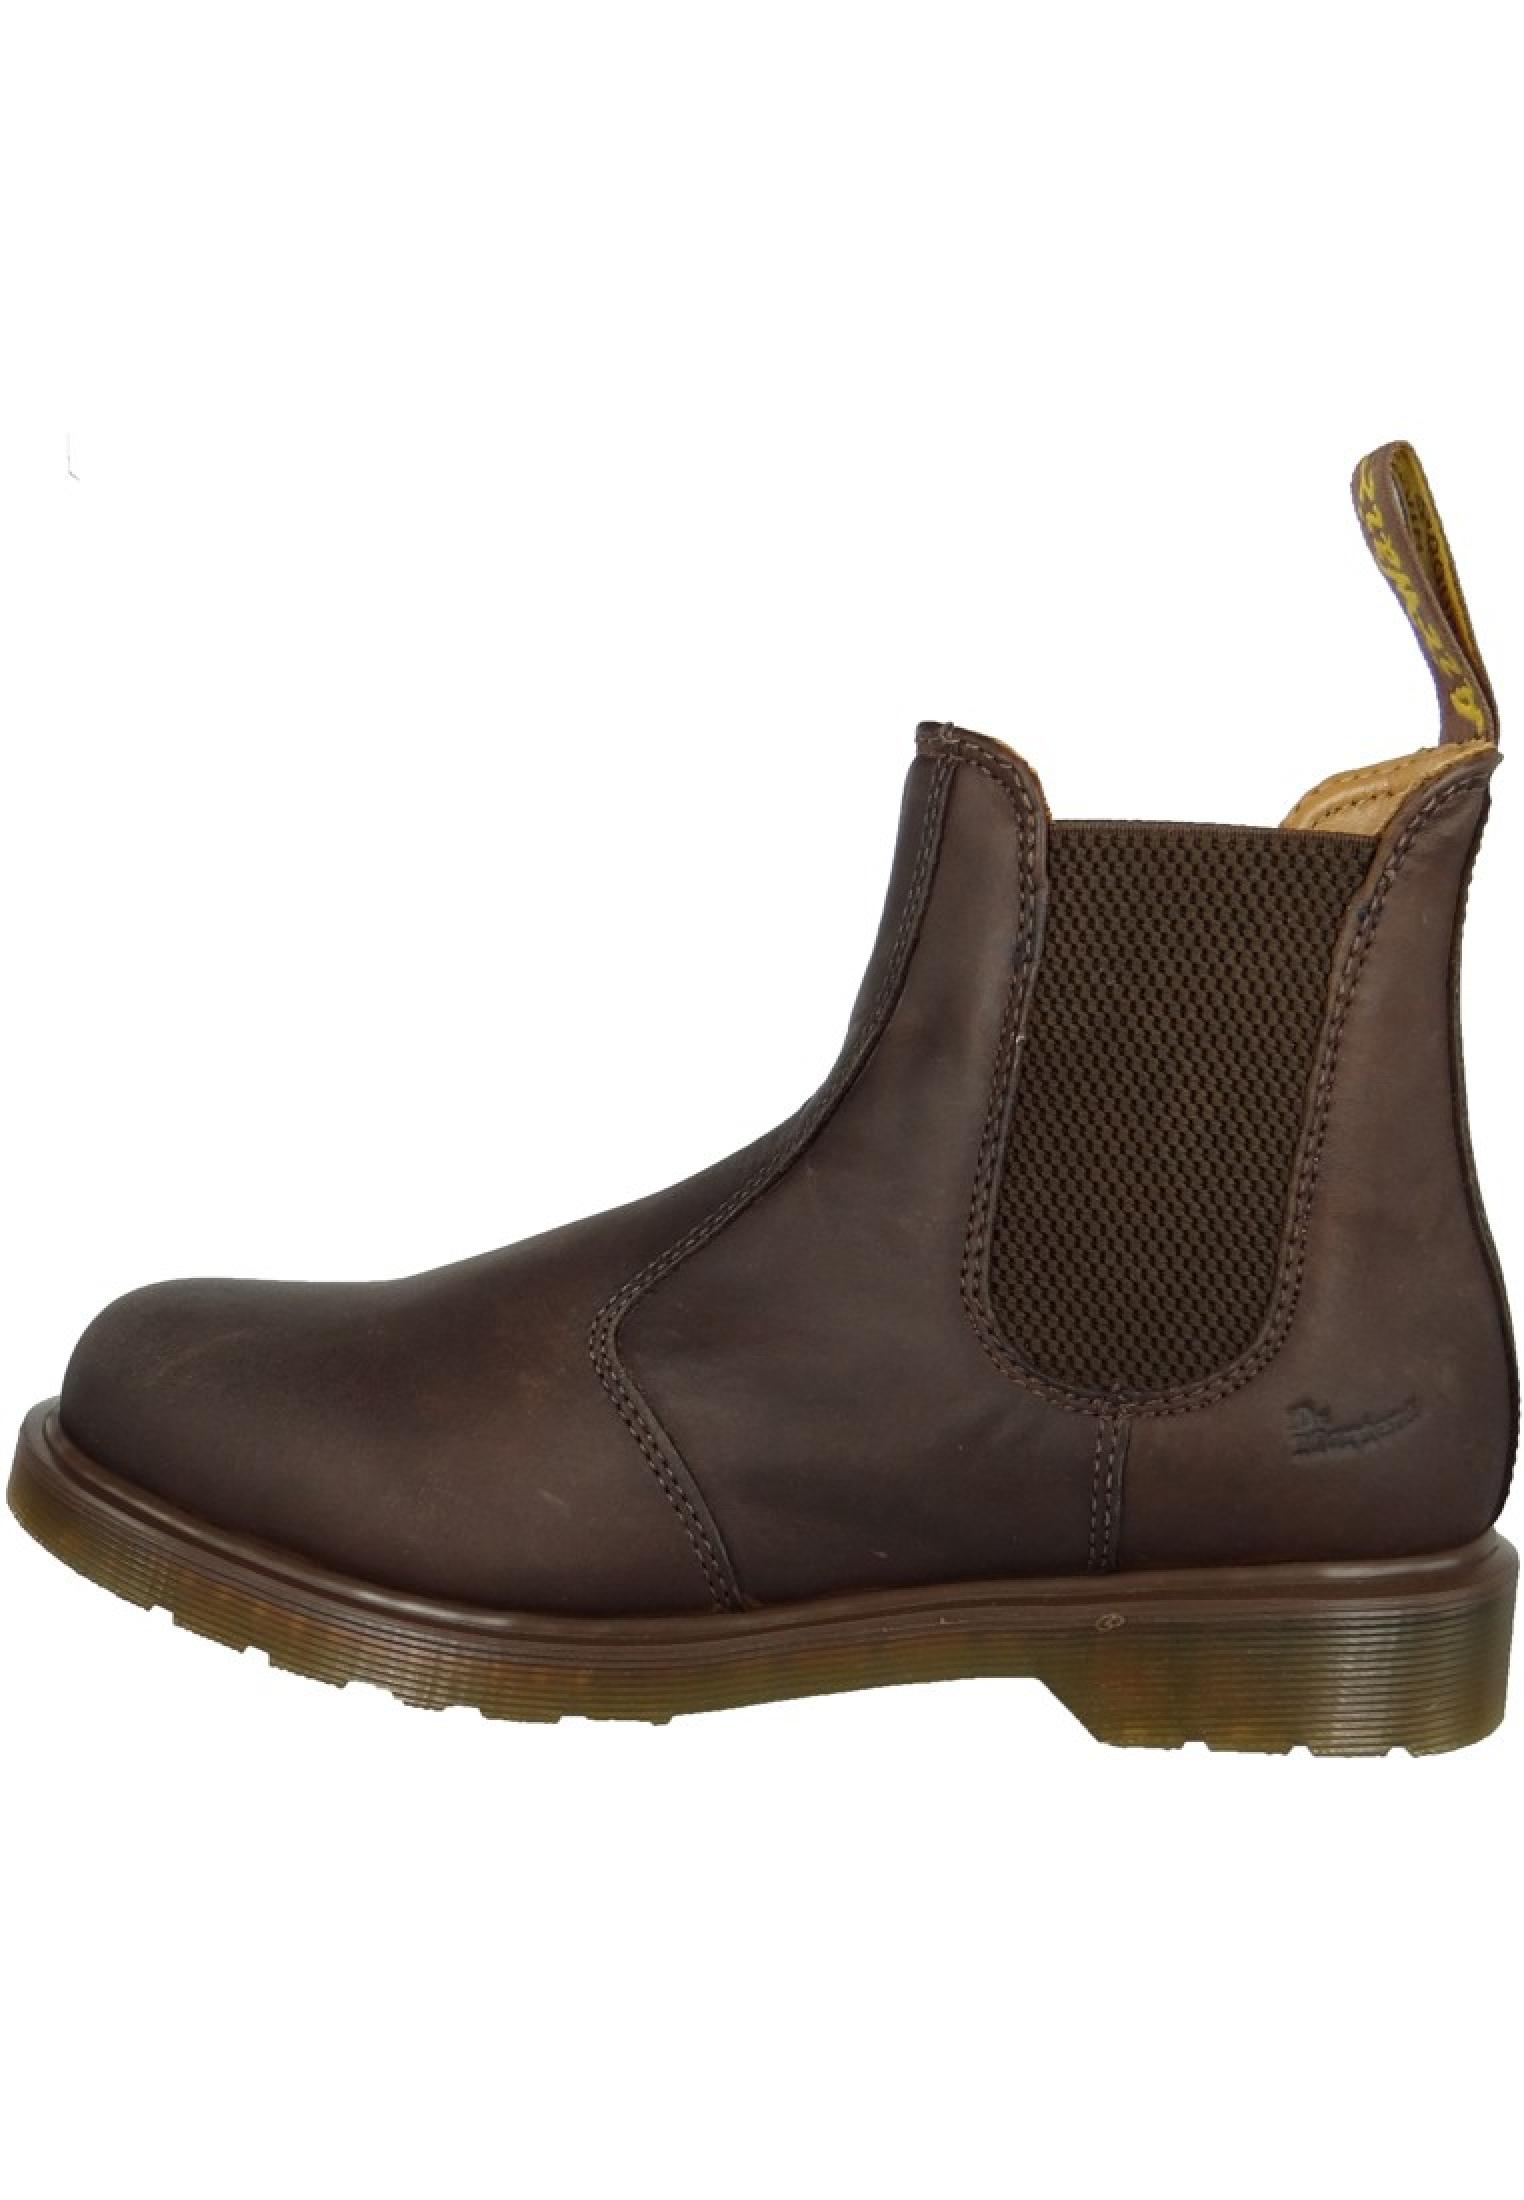 dr martens 2976 chelsea boot gaucho braun wildhorse 11853201 herrenschuhe stiefel boots. Black Bedroom Furniture Sets. Home Design Ideas